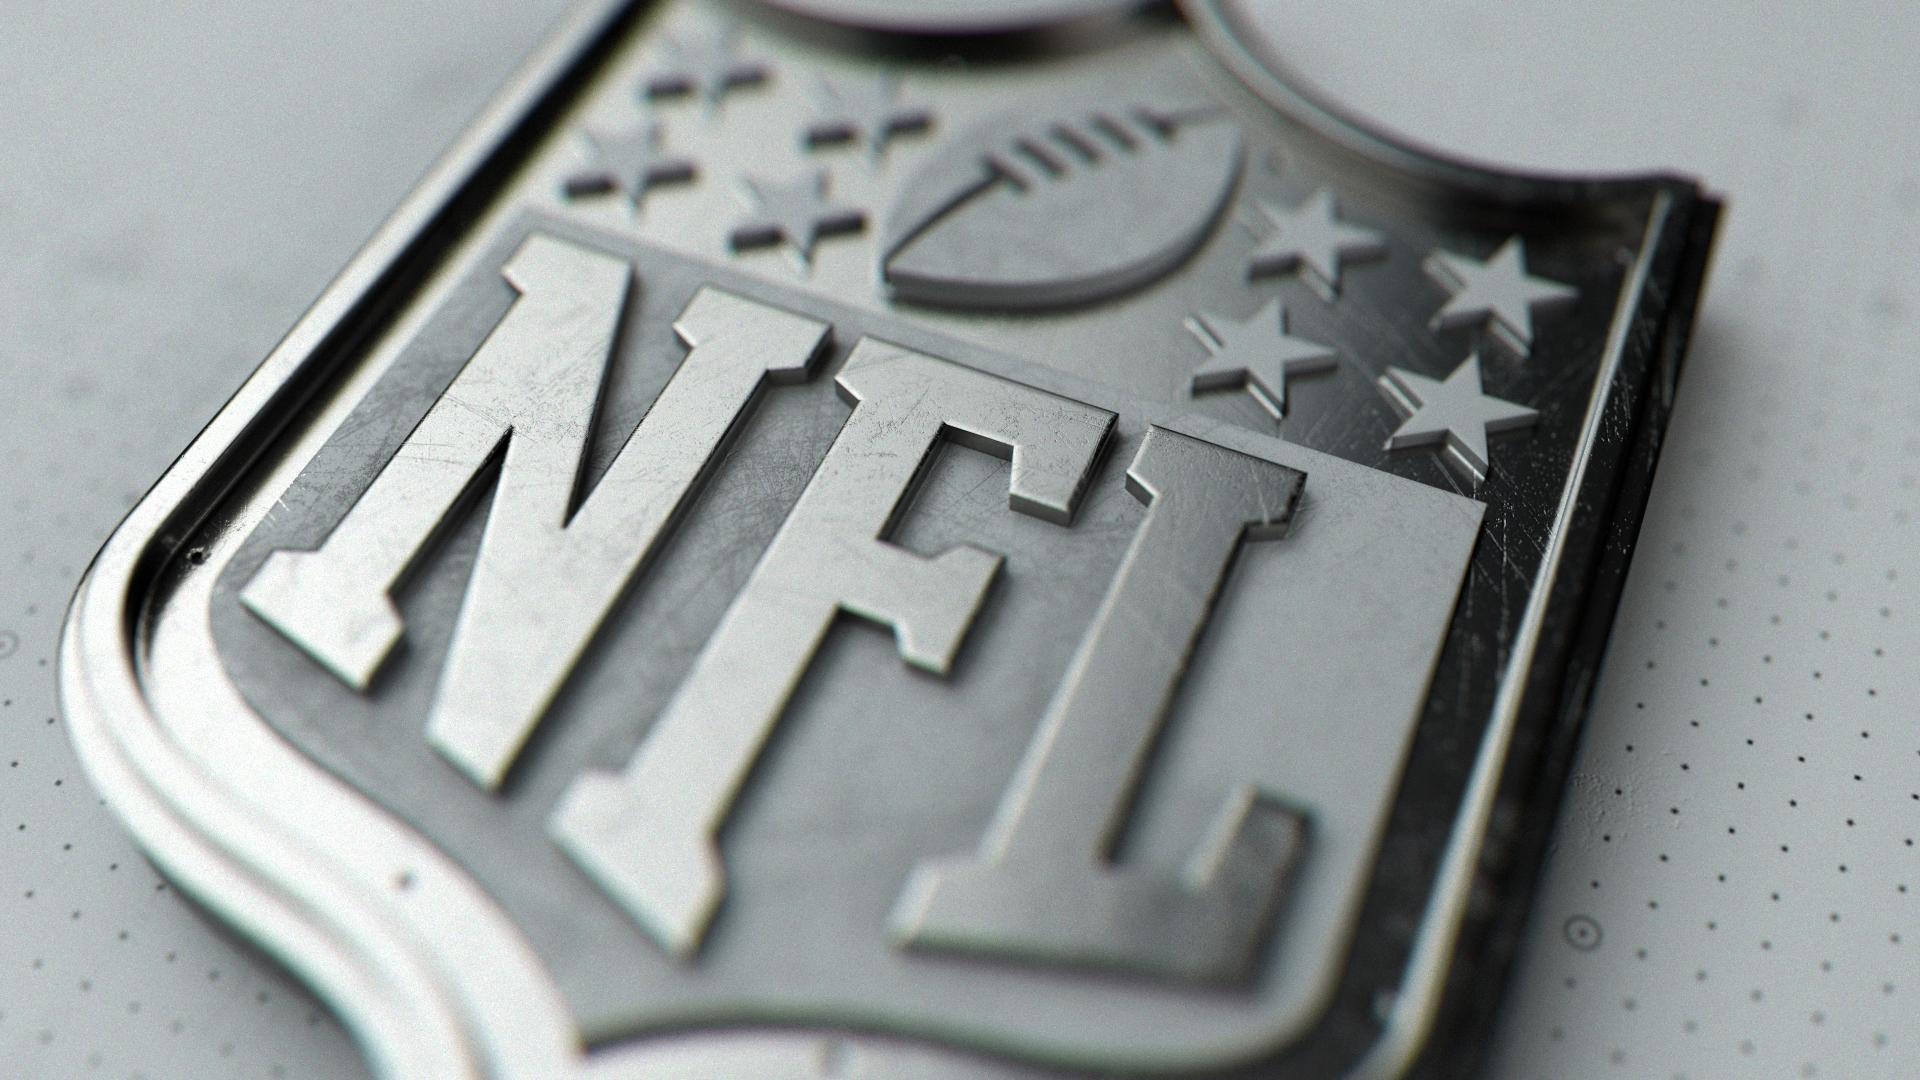 NFL_shield_redshift_03_RS_Camera_1_0001.jpg